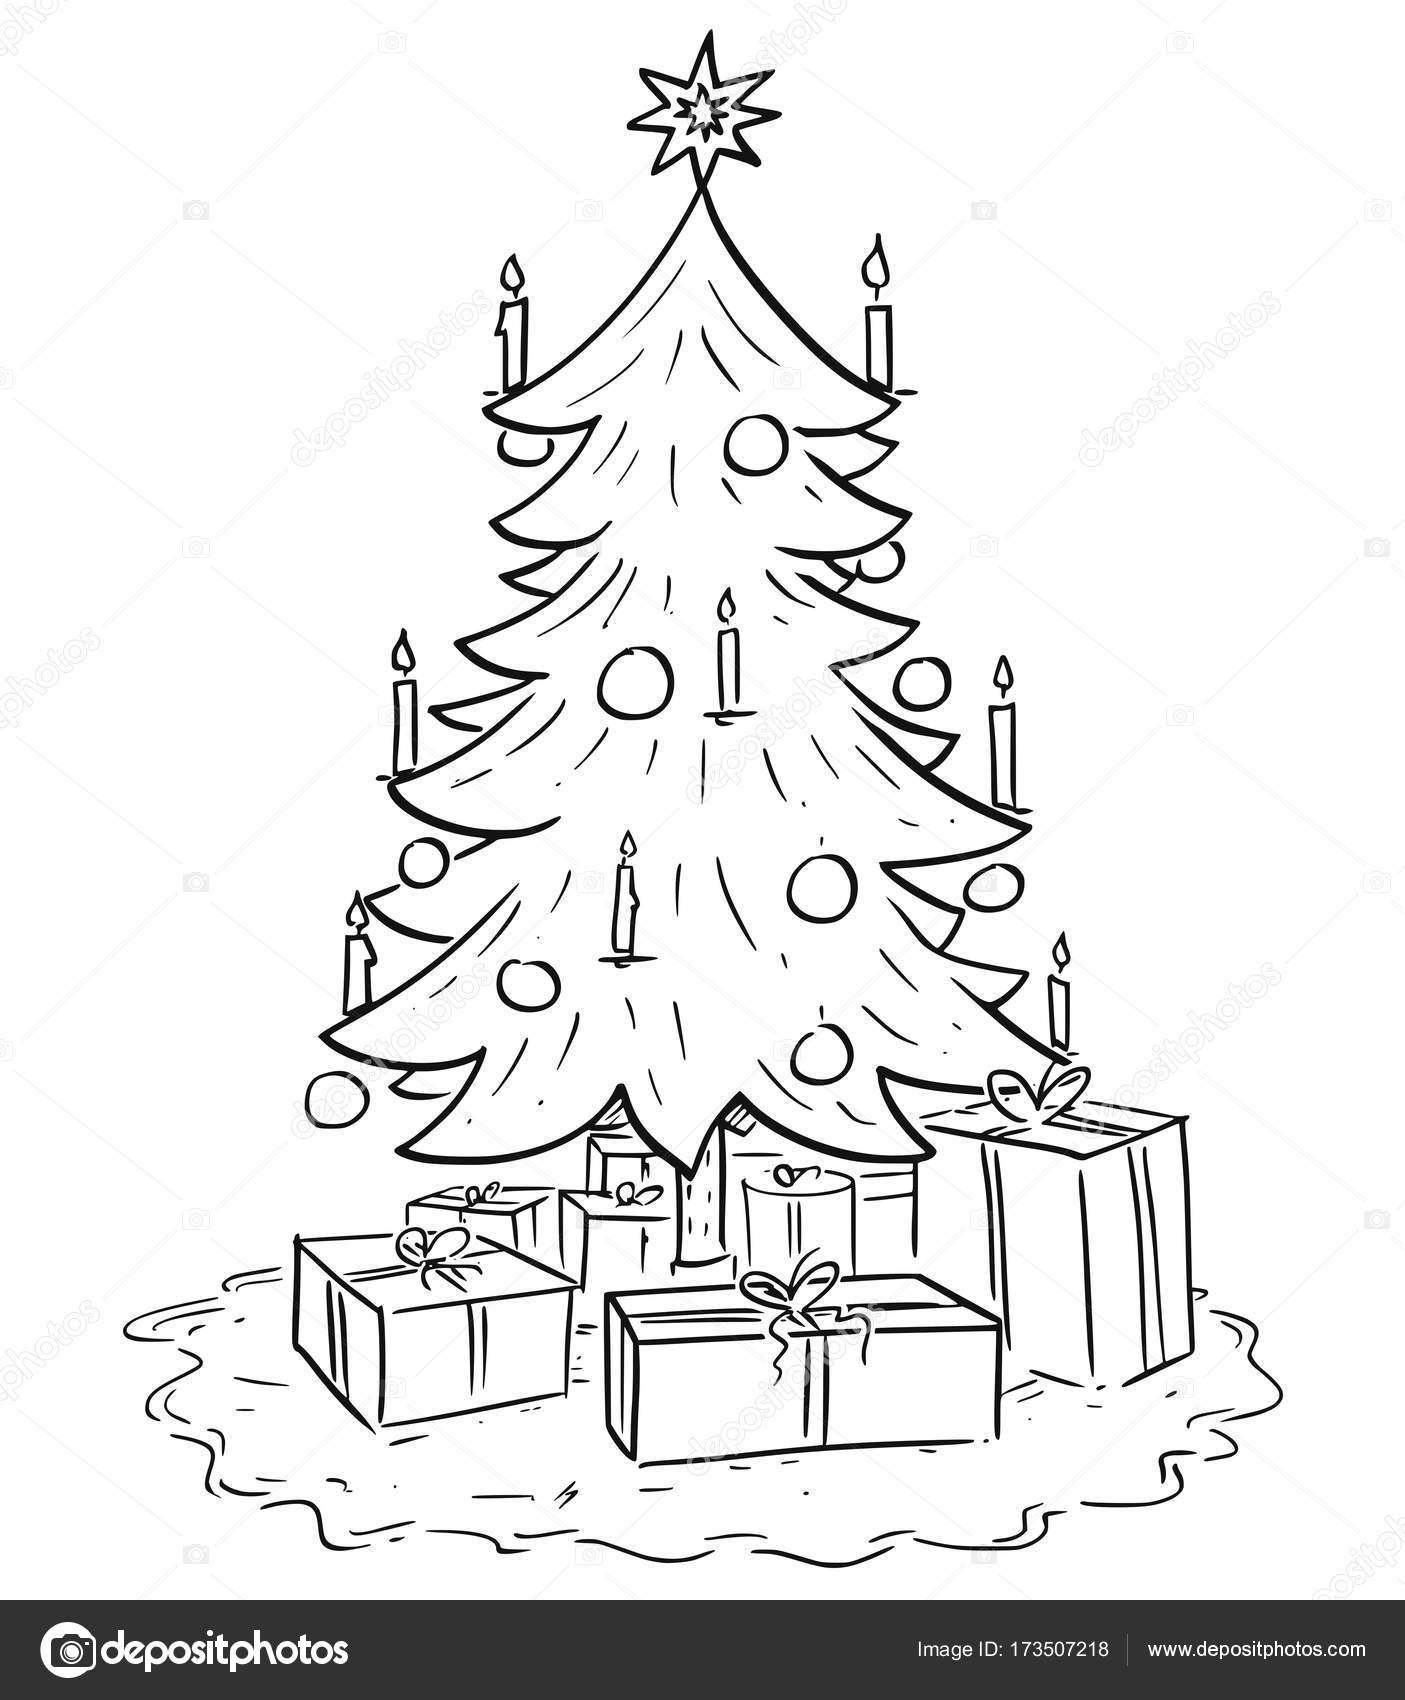 Cartoon Illustration Of Christmas Xmas Tree With Gifts Stock Vector C Ursus Zdeneksasek Com 173507218 Cartoon tree low poly 3d model. depositphotos